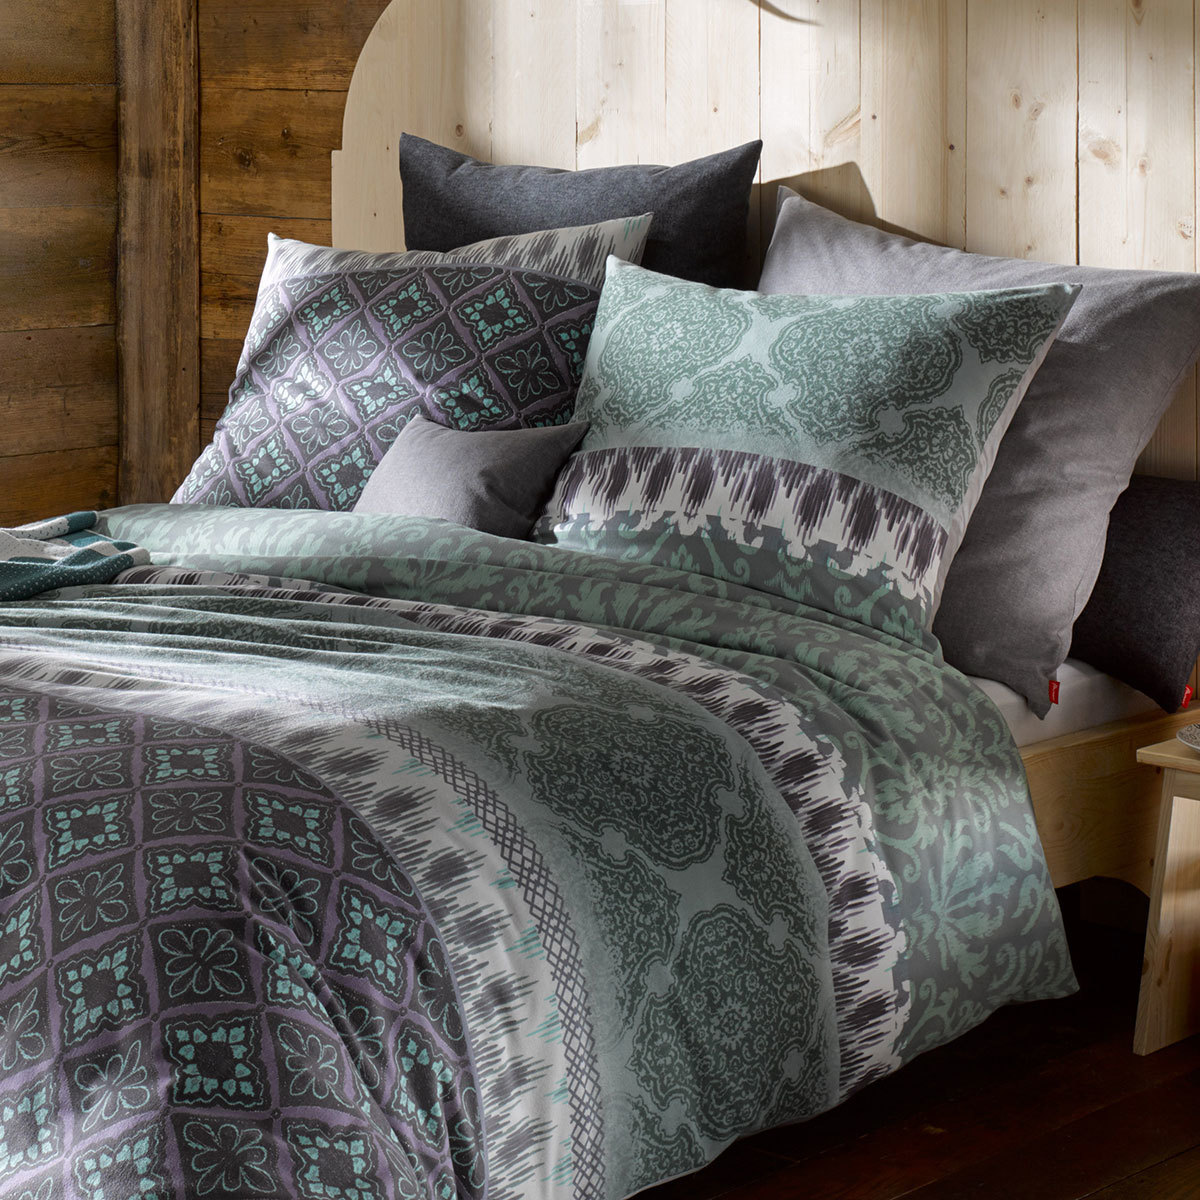 fleuresse biber bettw sche aspen luxus forest g nstig online kaufen bei bettwaren shop. Black Bedroom Furniture Sets. Home Design Ideas